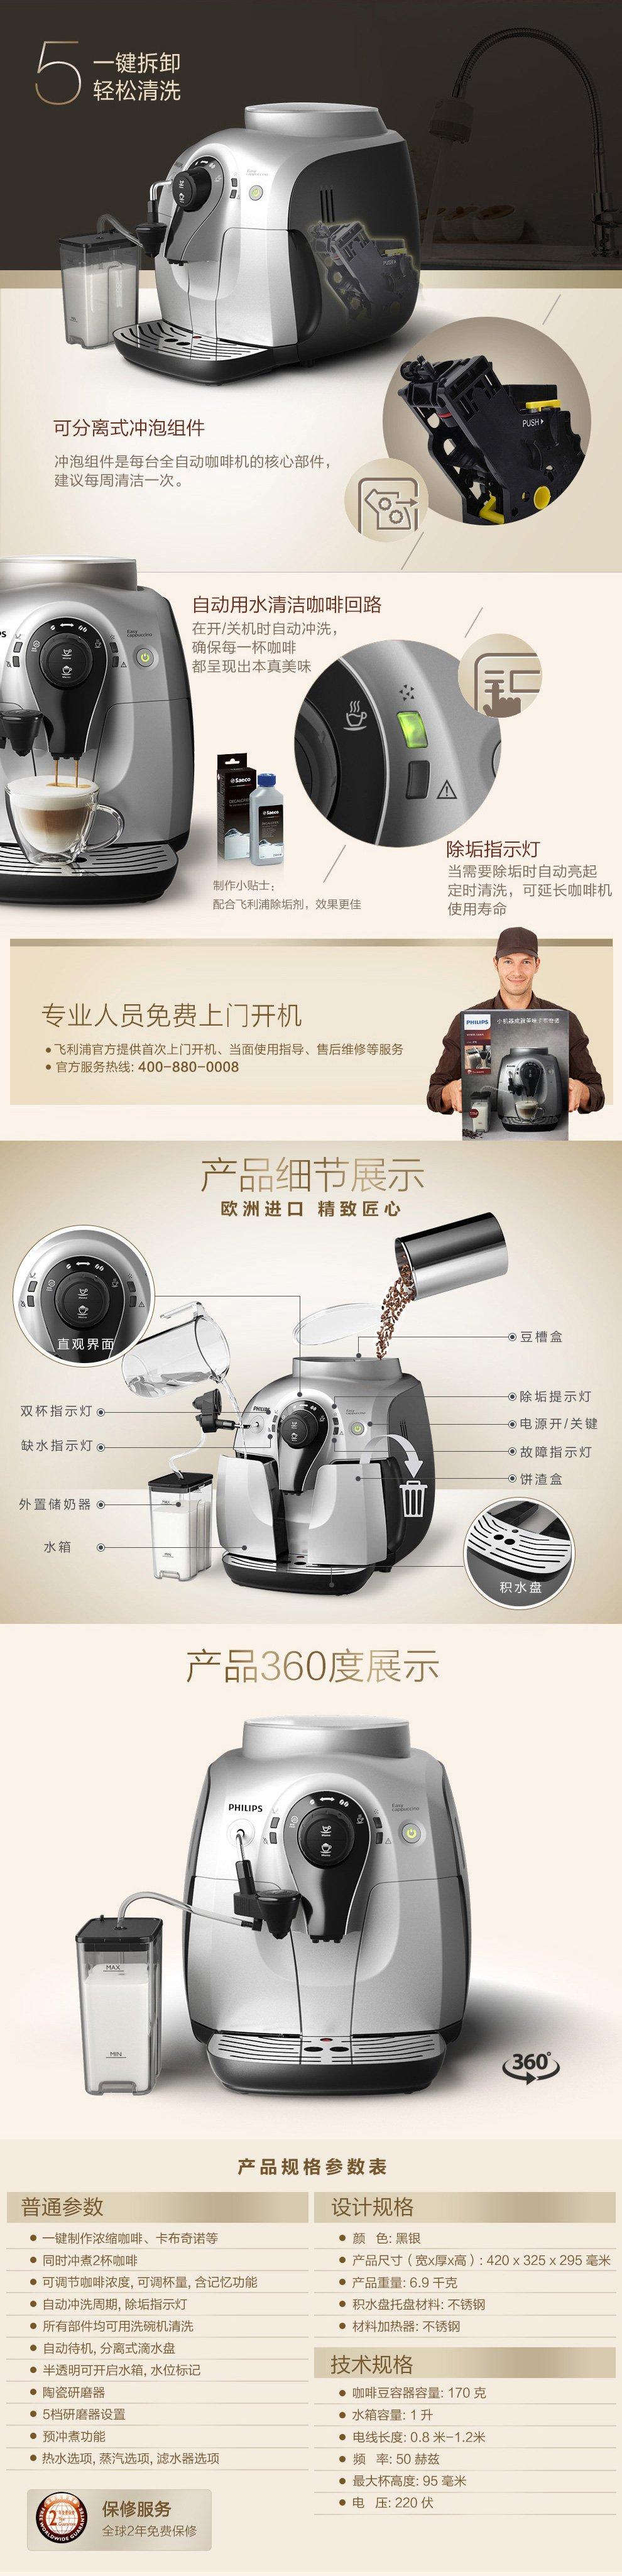 Philips 飞利浦 2100 series全自动浓缩咖啡机HD8652/57